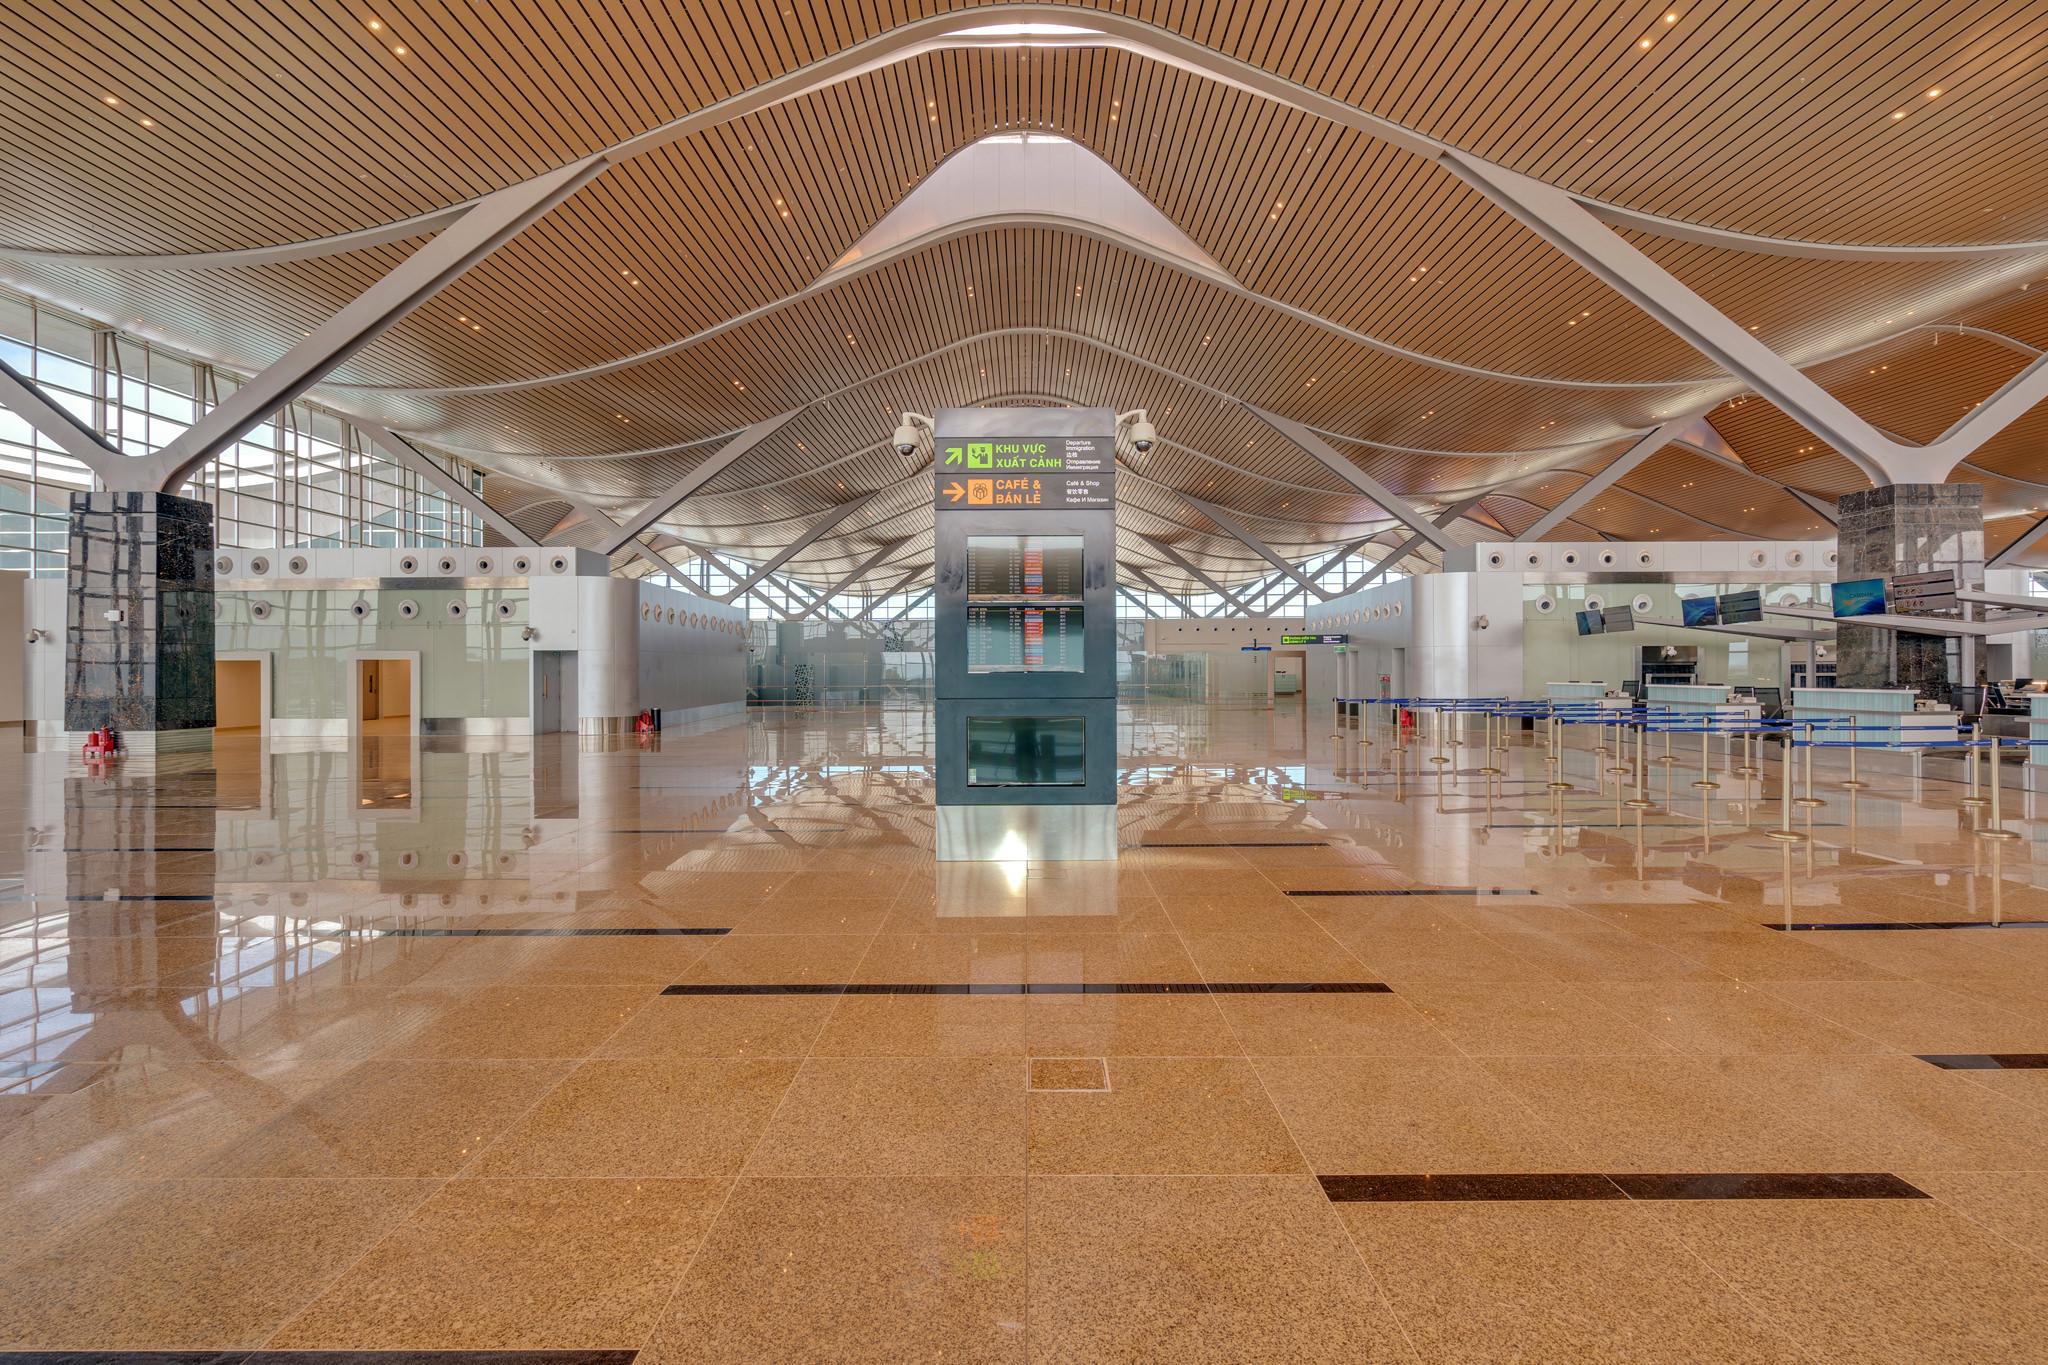 20180626 - Cam Ranh Airport - Architecture - 0303.jpg